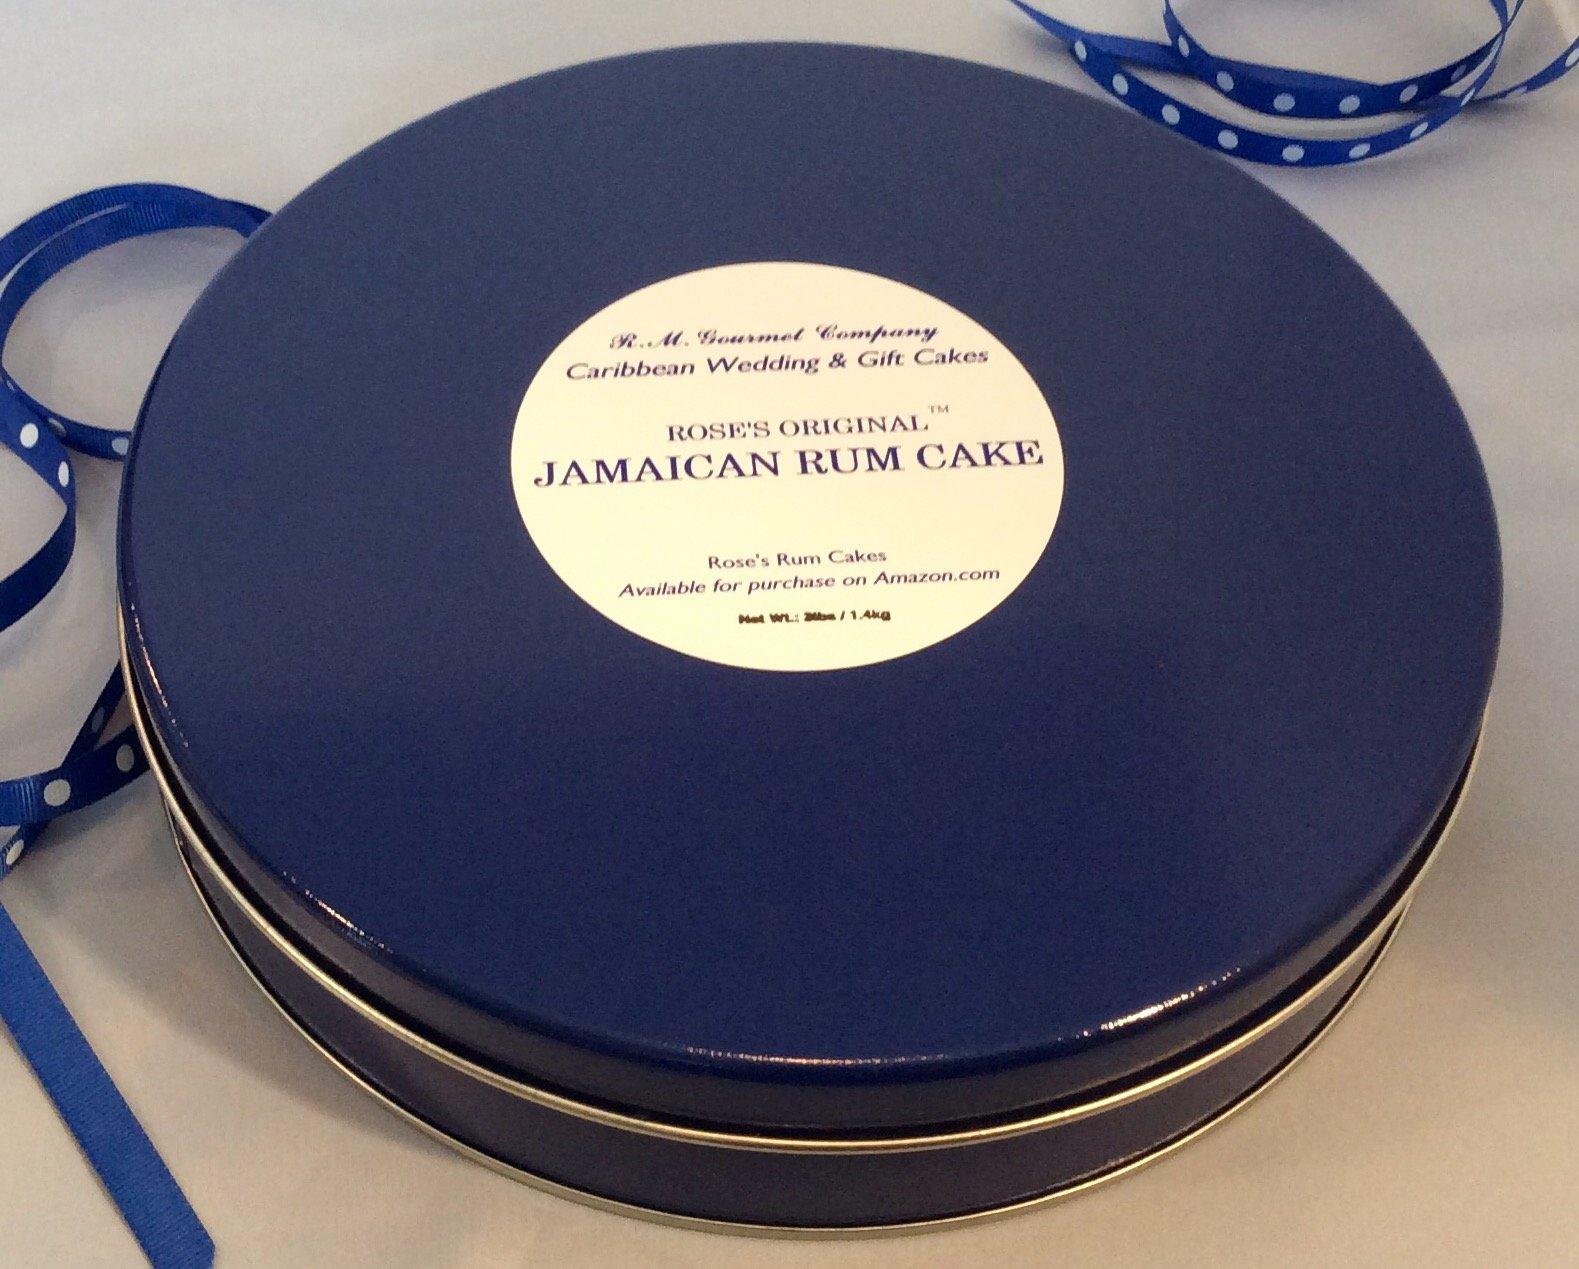 Rose's Original Jamaican Rum Cake by R.M. Gourmet Co. (3lb/1.4kg) by R.M. Gourmet Co. (Image #1)